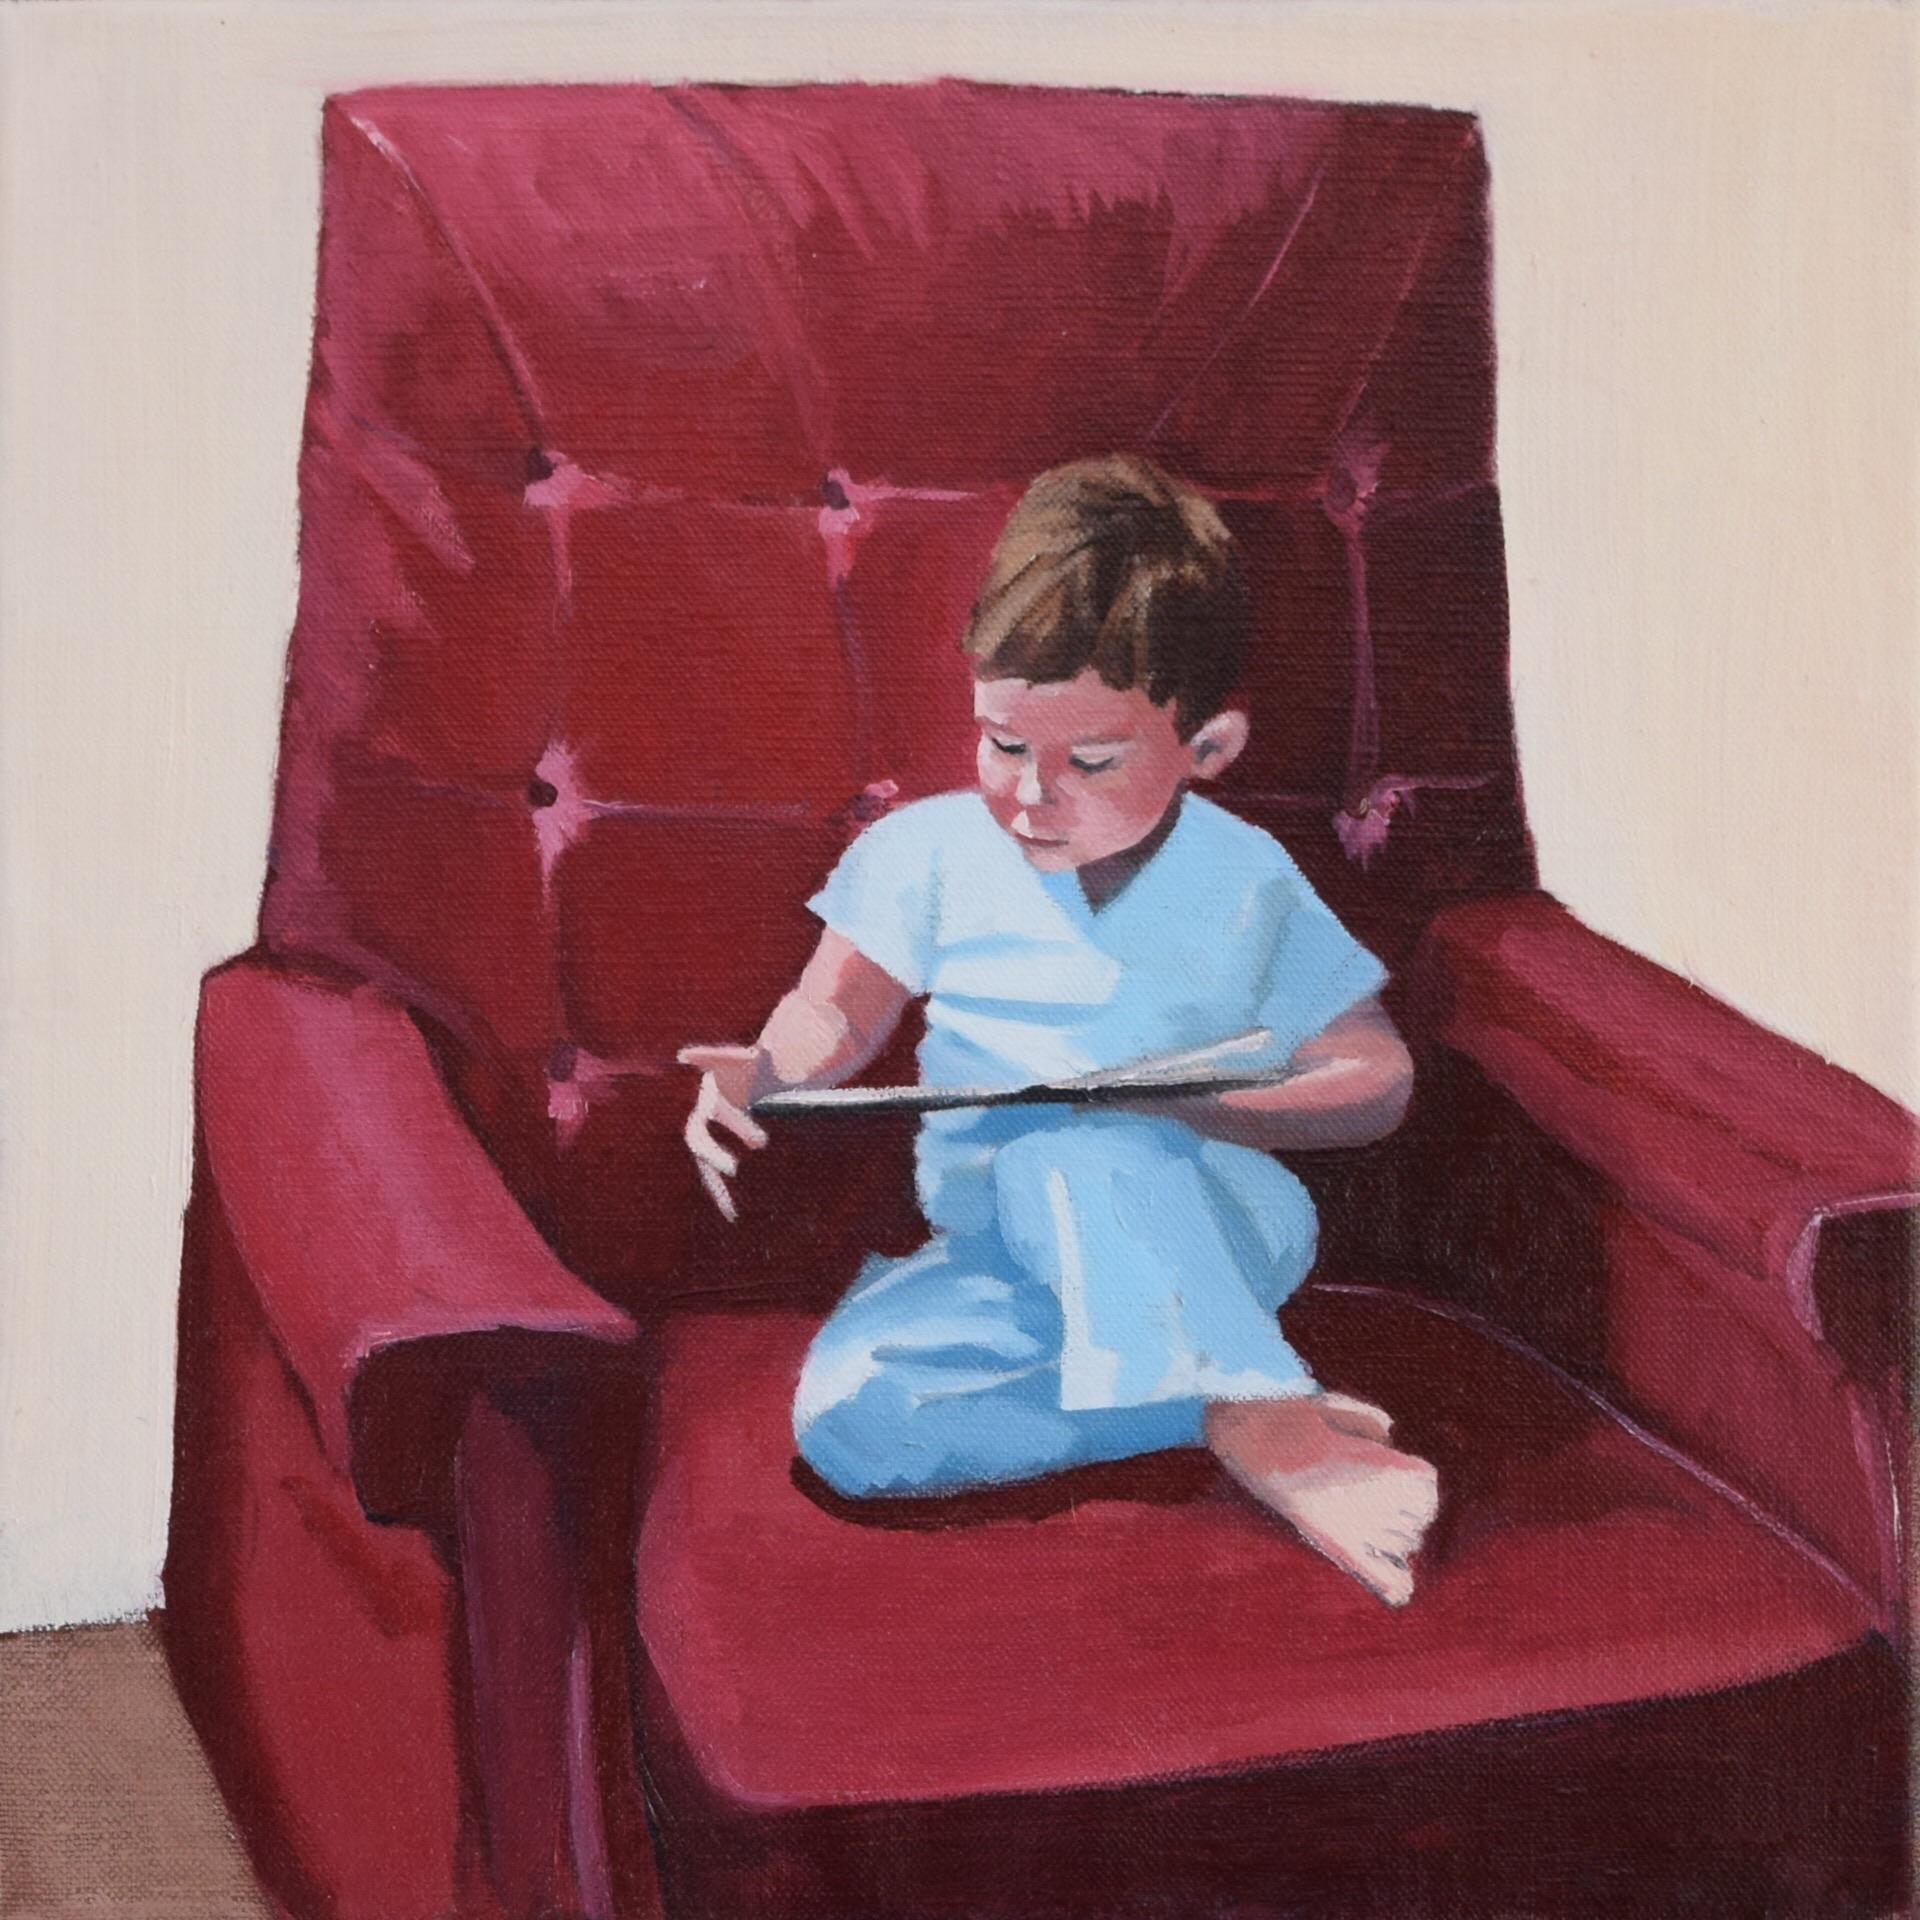 Baker,Margaret-Red Chair-12x12 inch oil on canvas.jpg